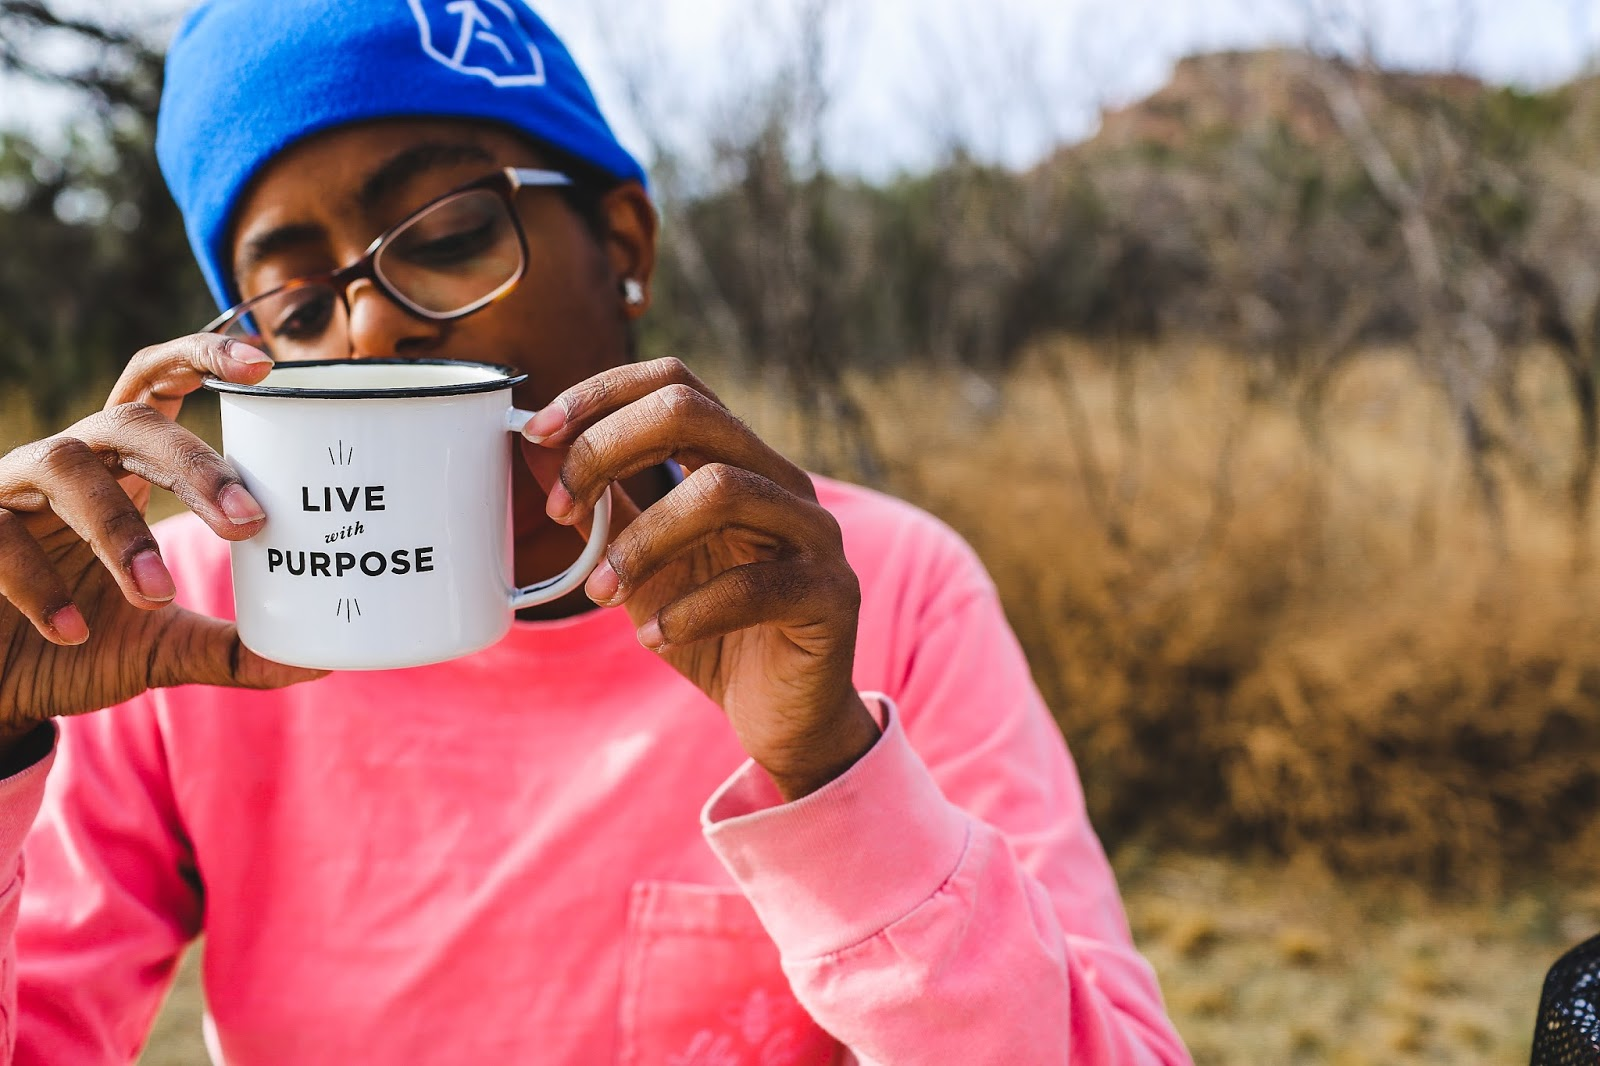 Live with Purpose Mug